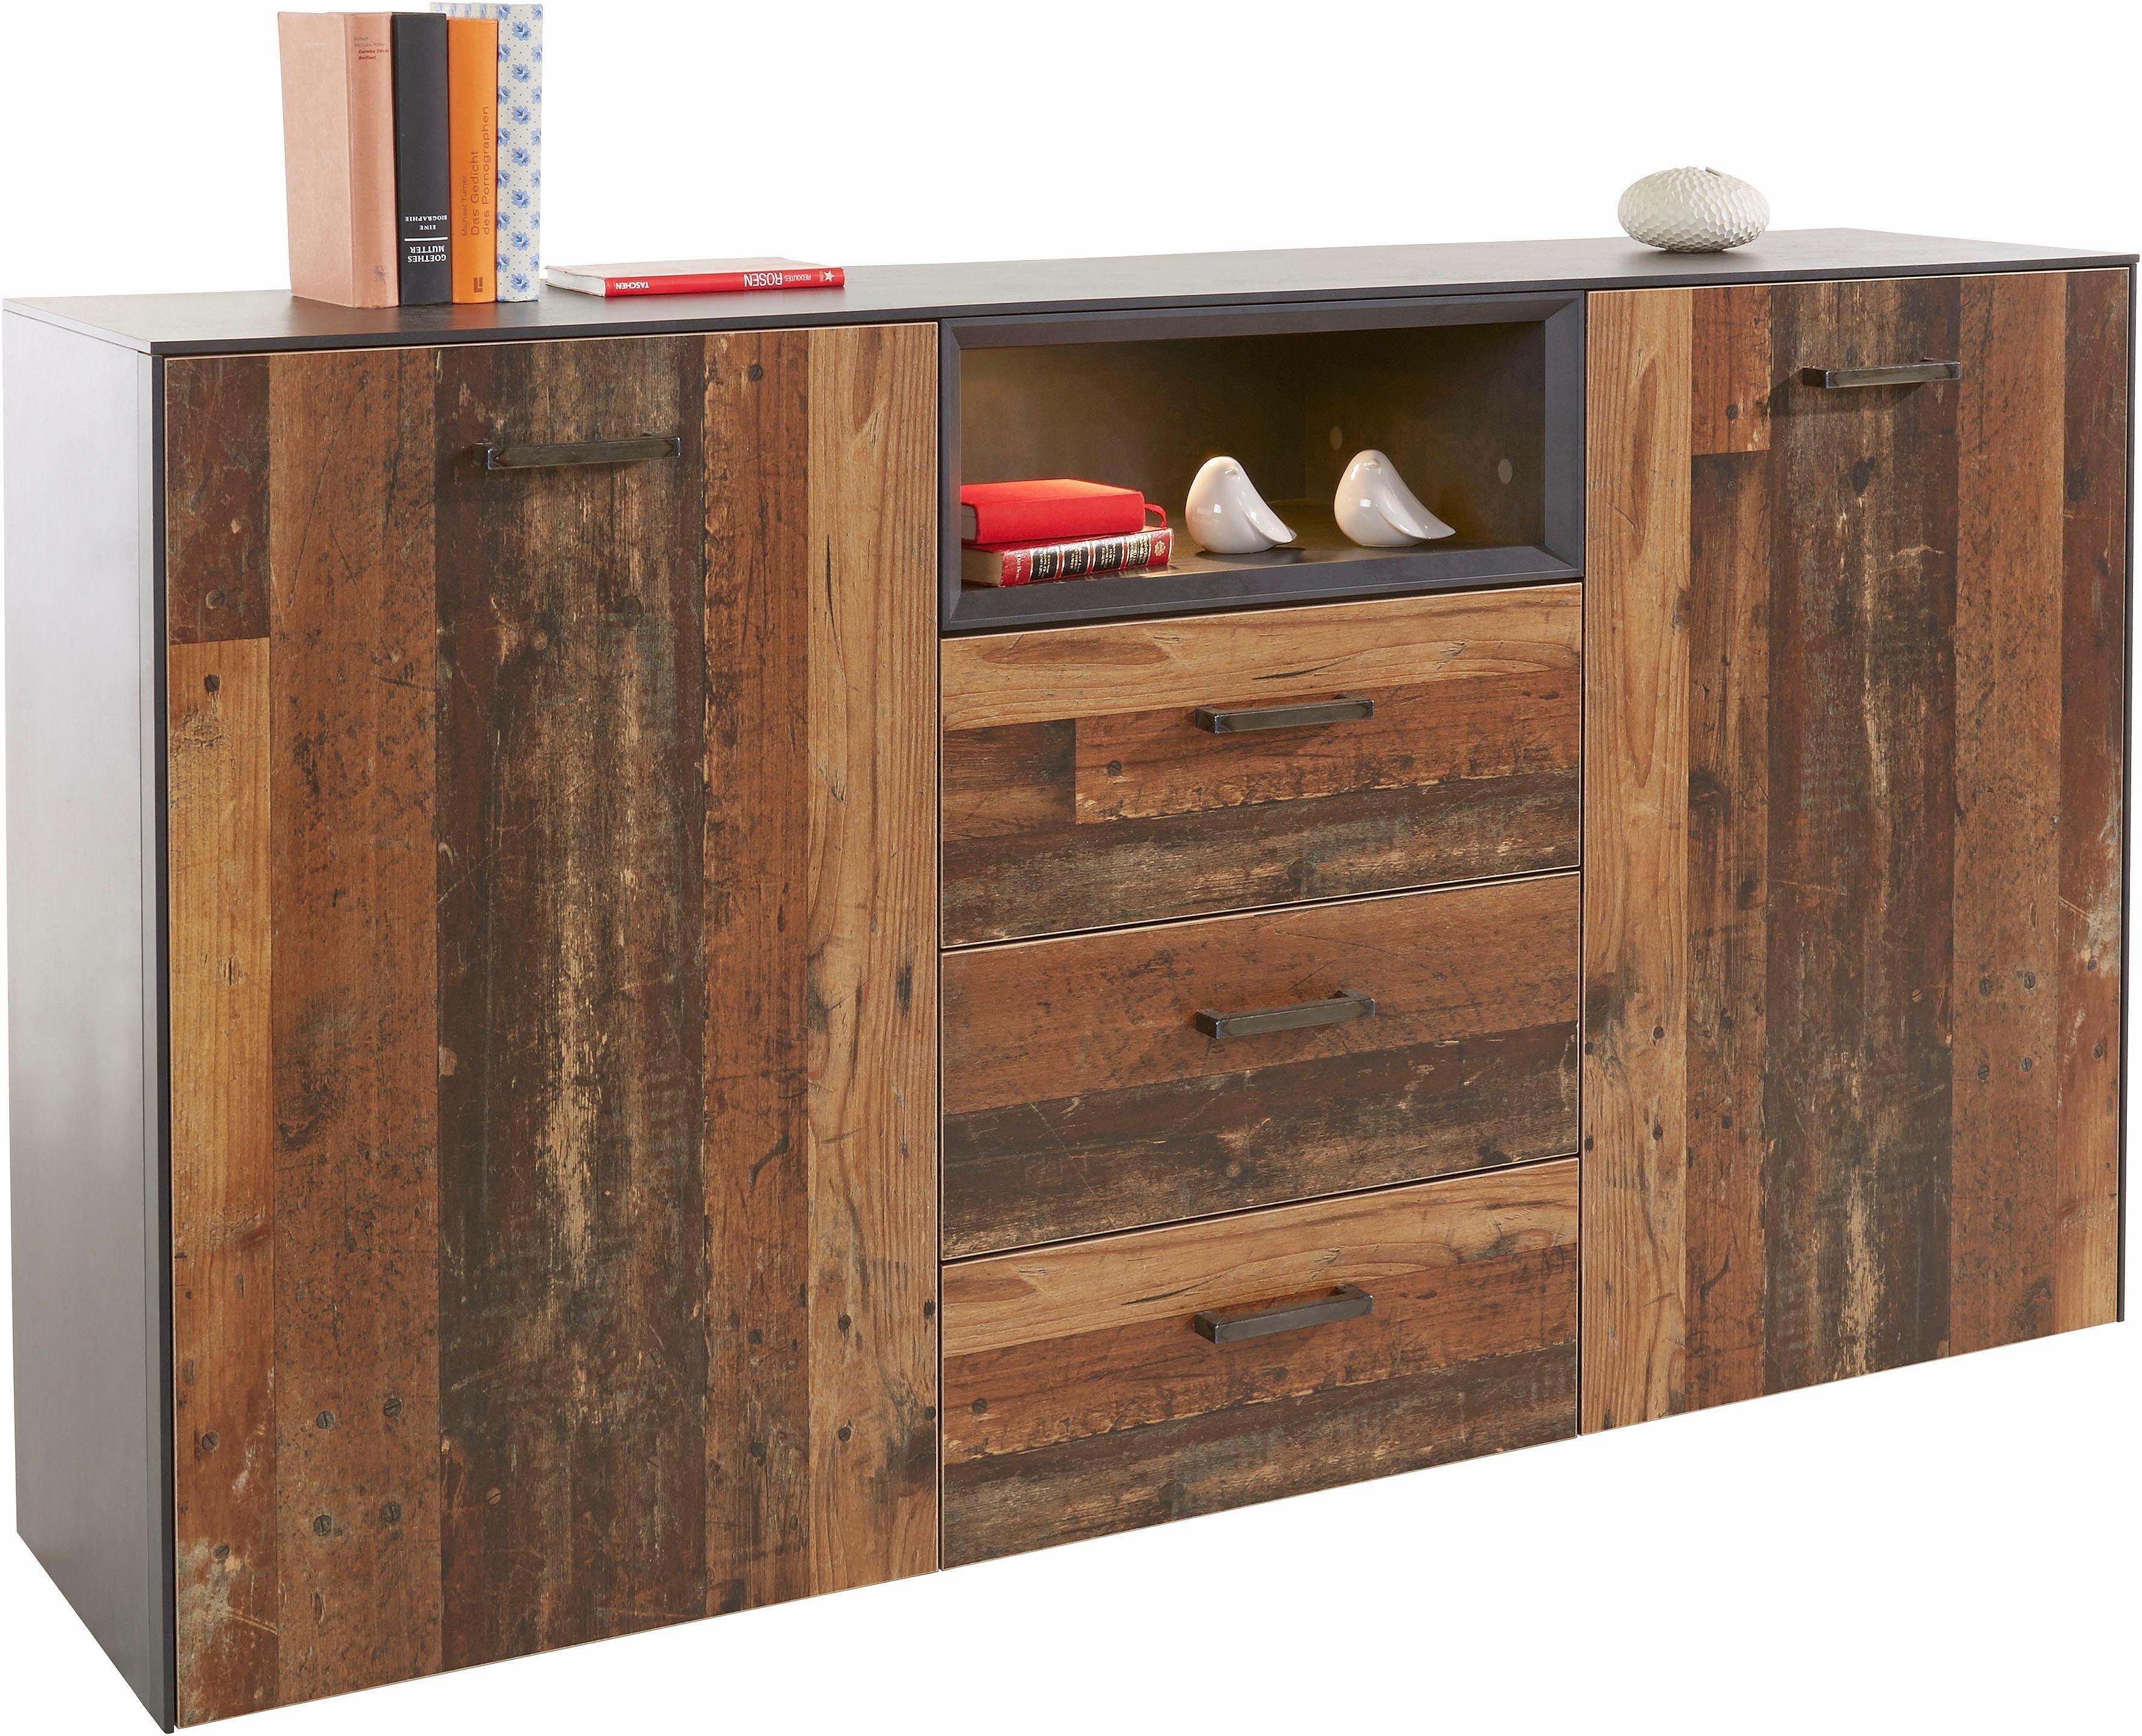 Sideboard, Breite 177 cm